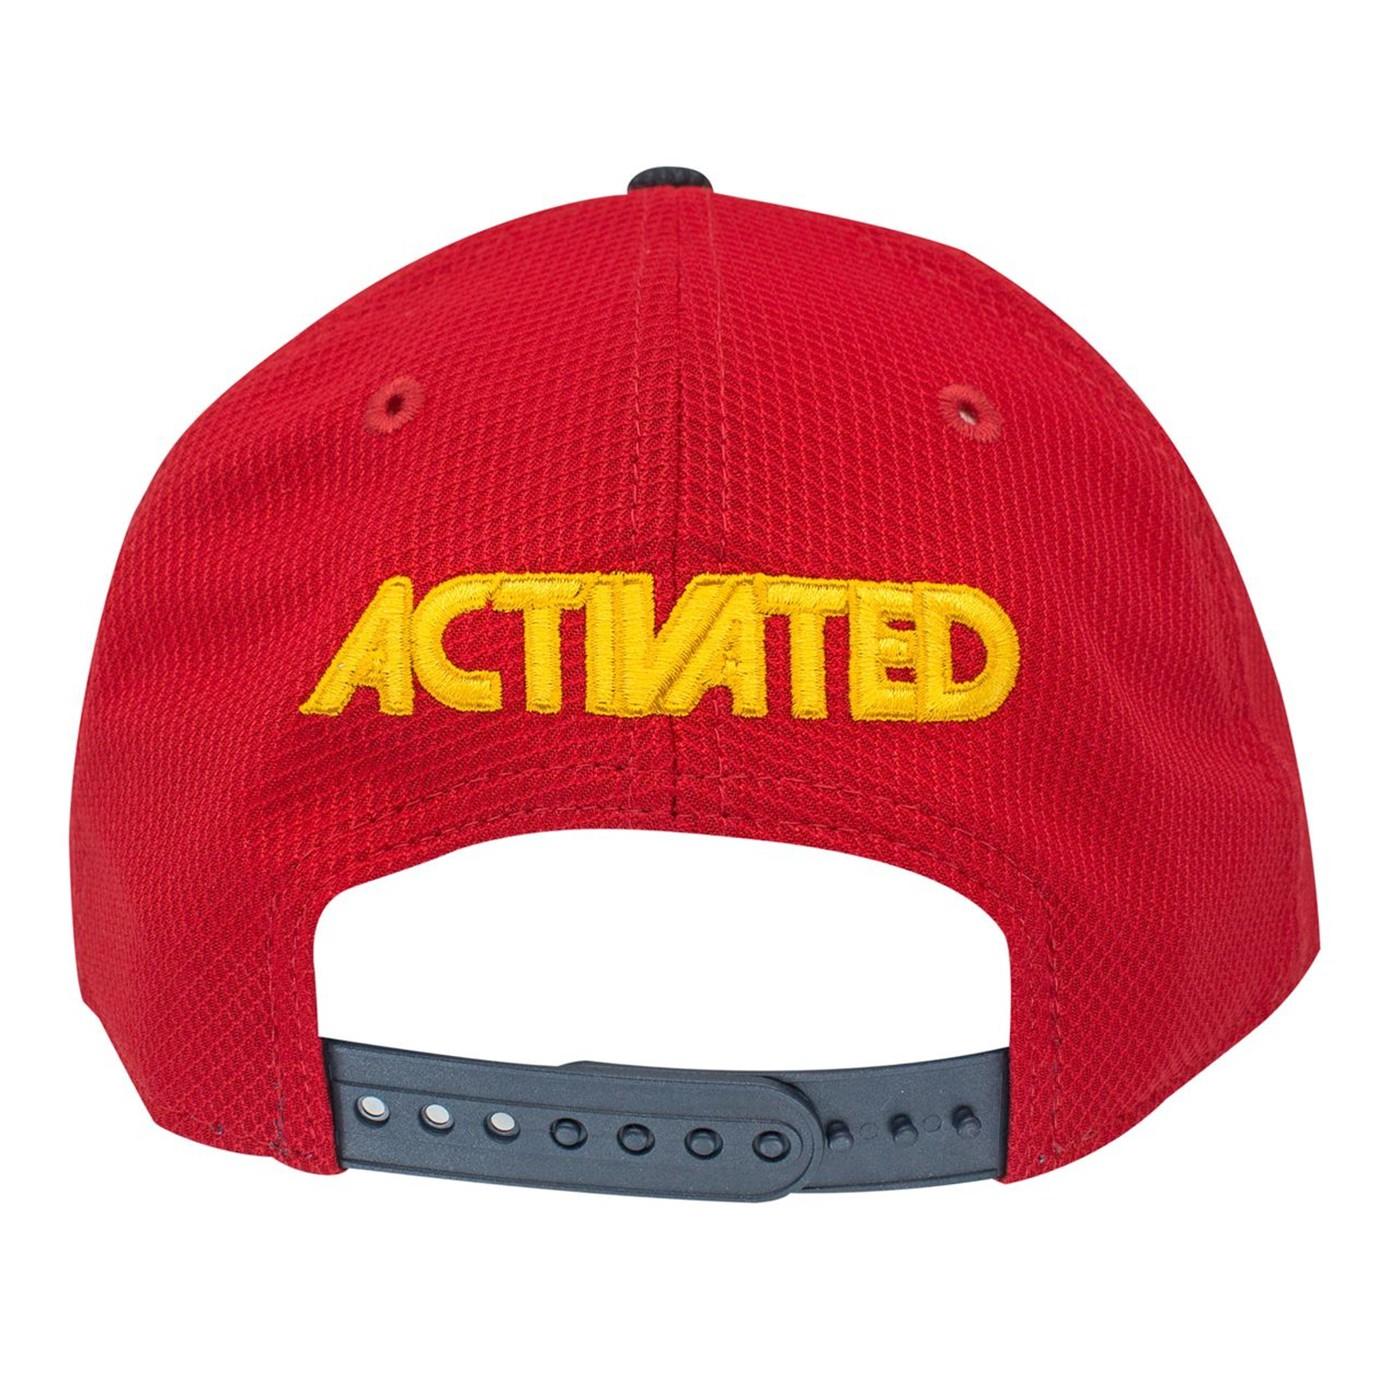 Captain Marvel Scarlet Red New Era 9Fifty Adjustable Hat